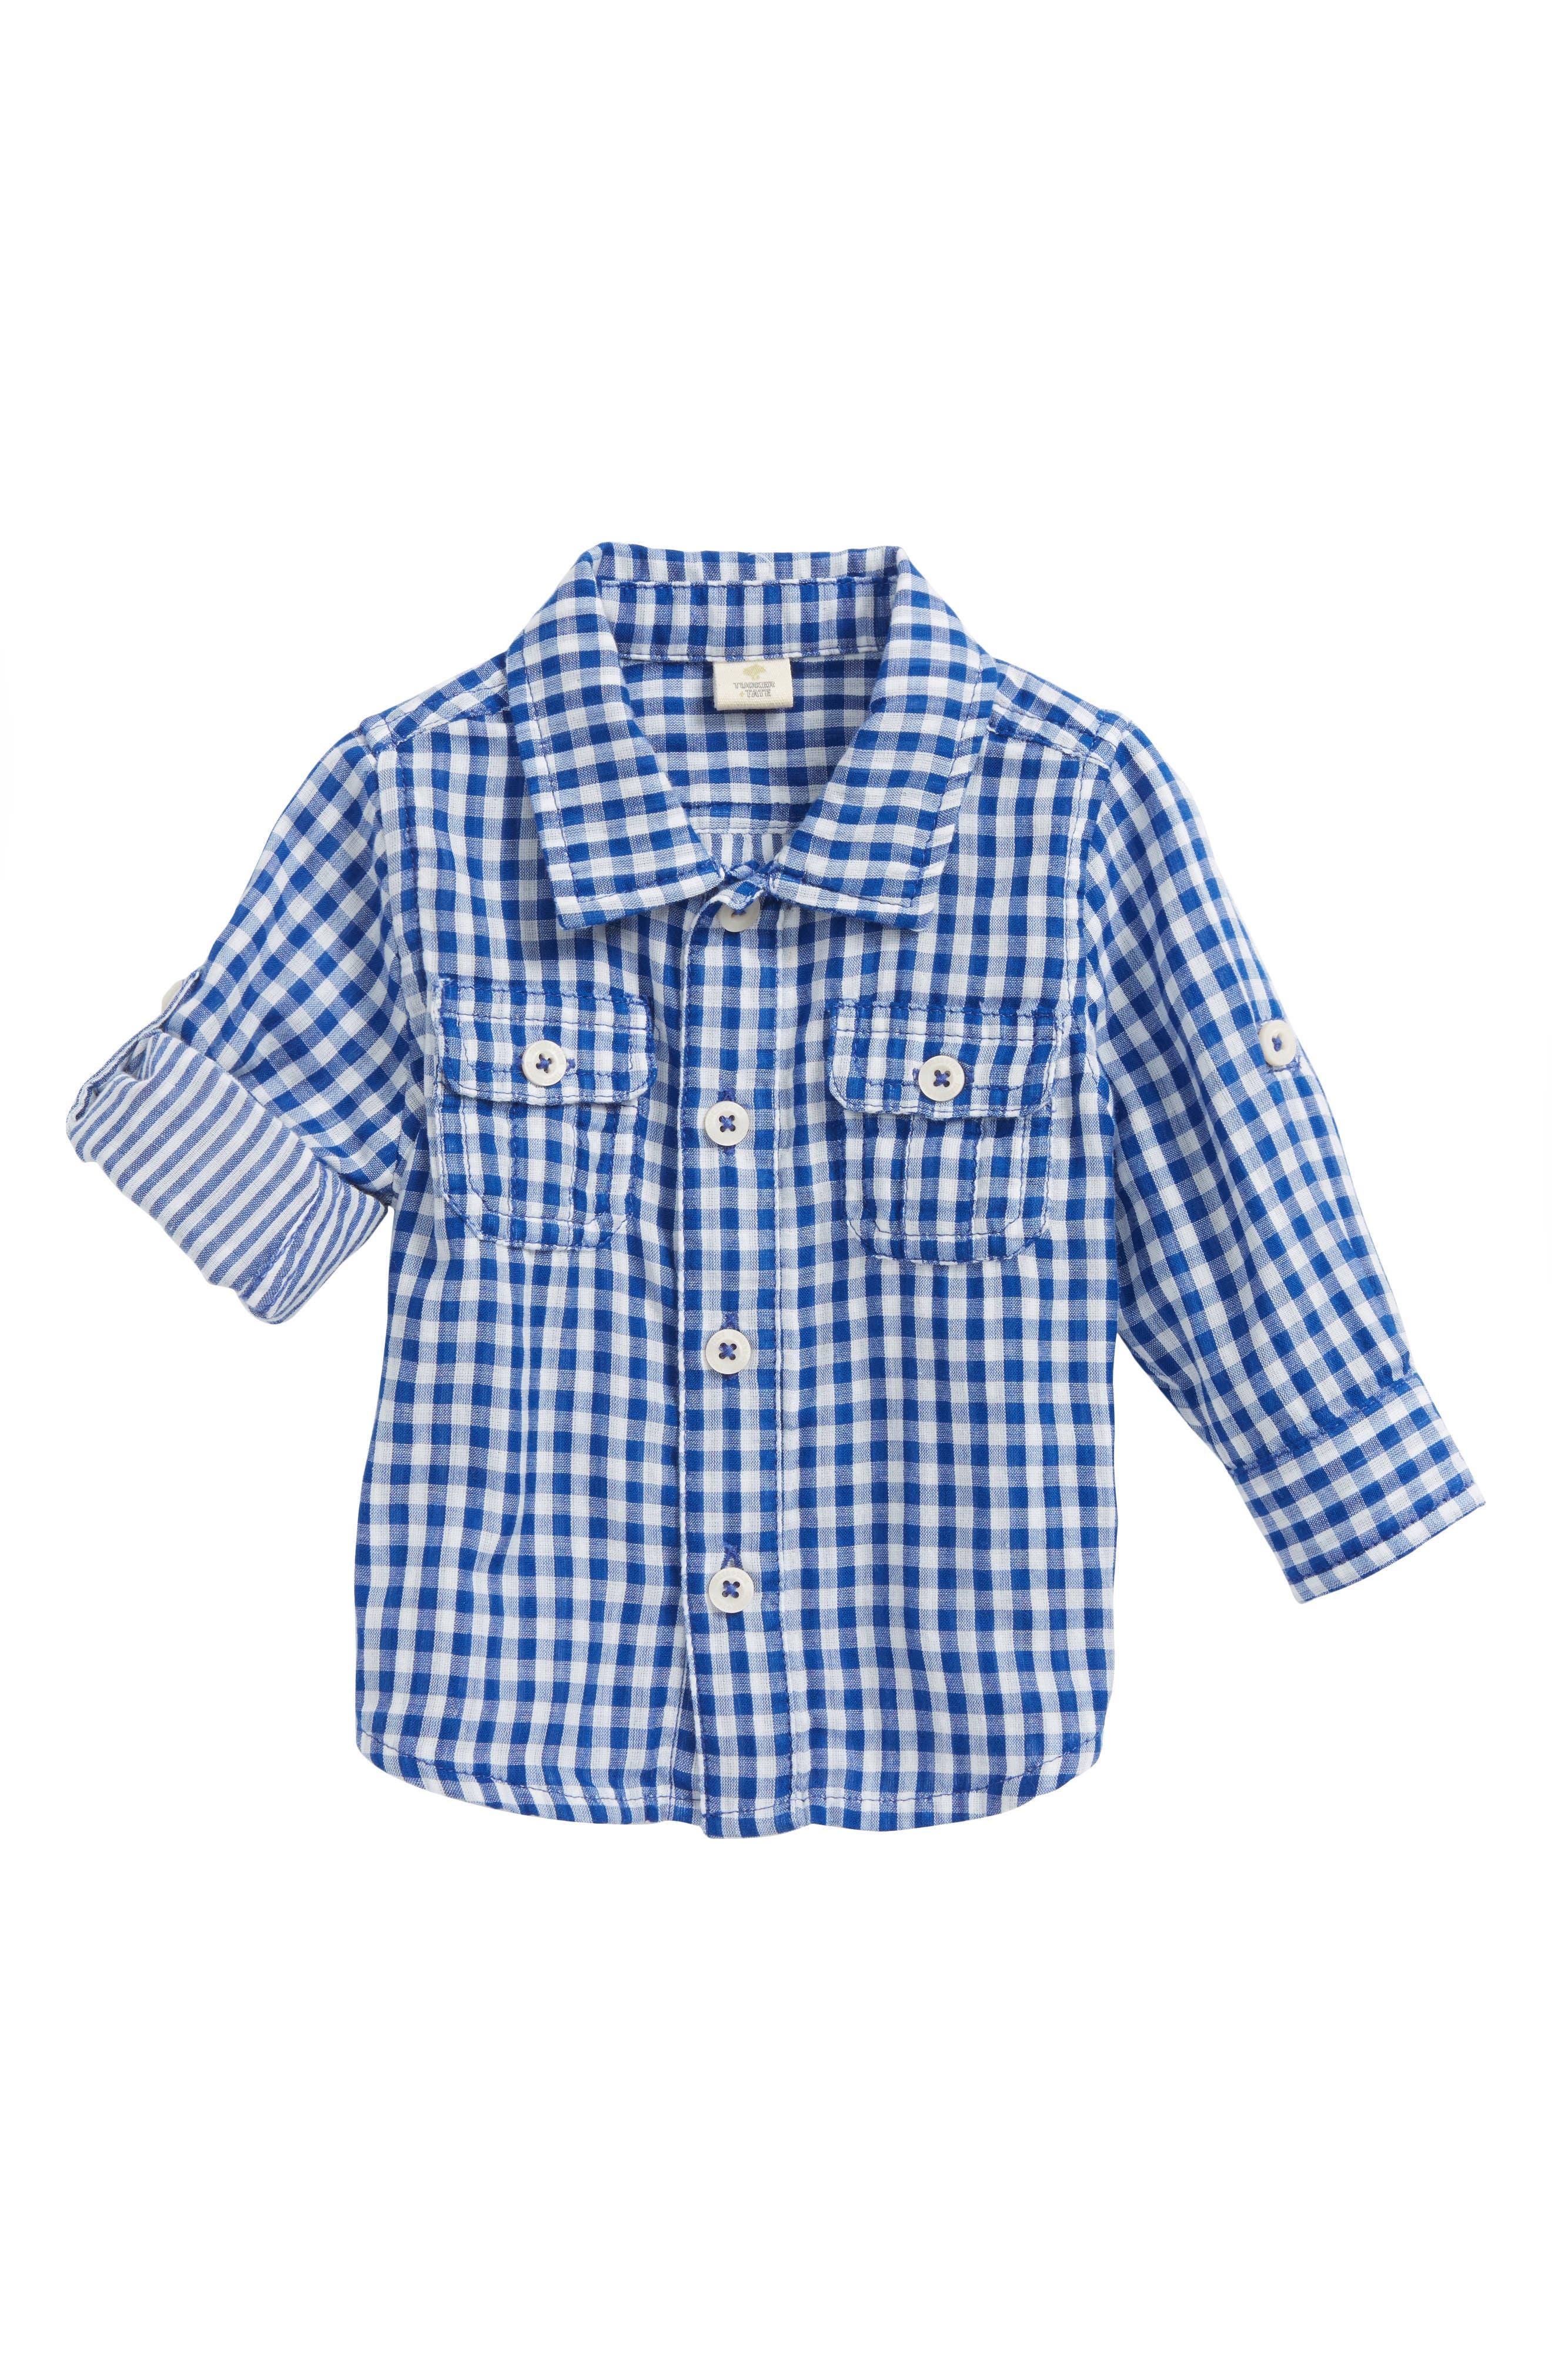 Double Woven Shirt,                         Main,                         color, Blue Calm Gingham